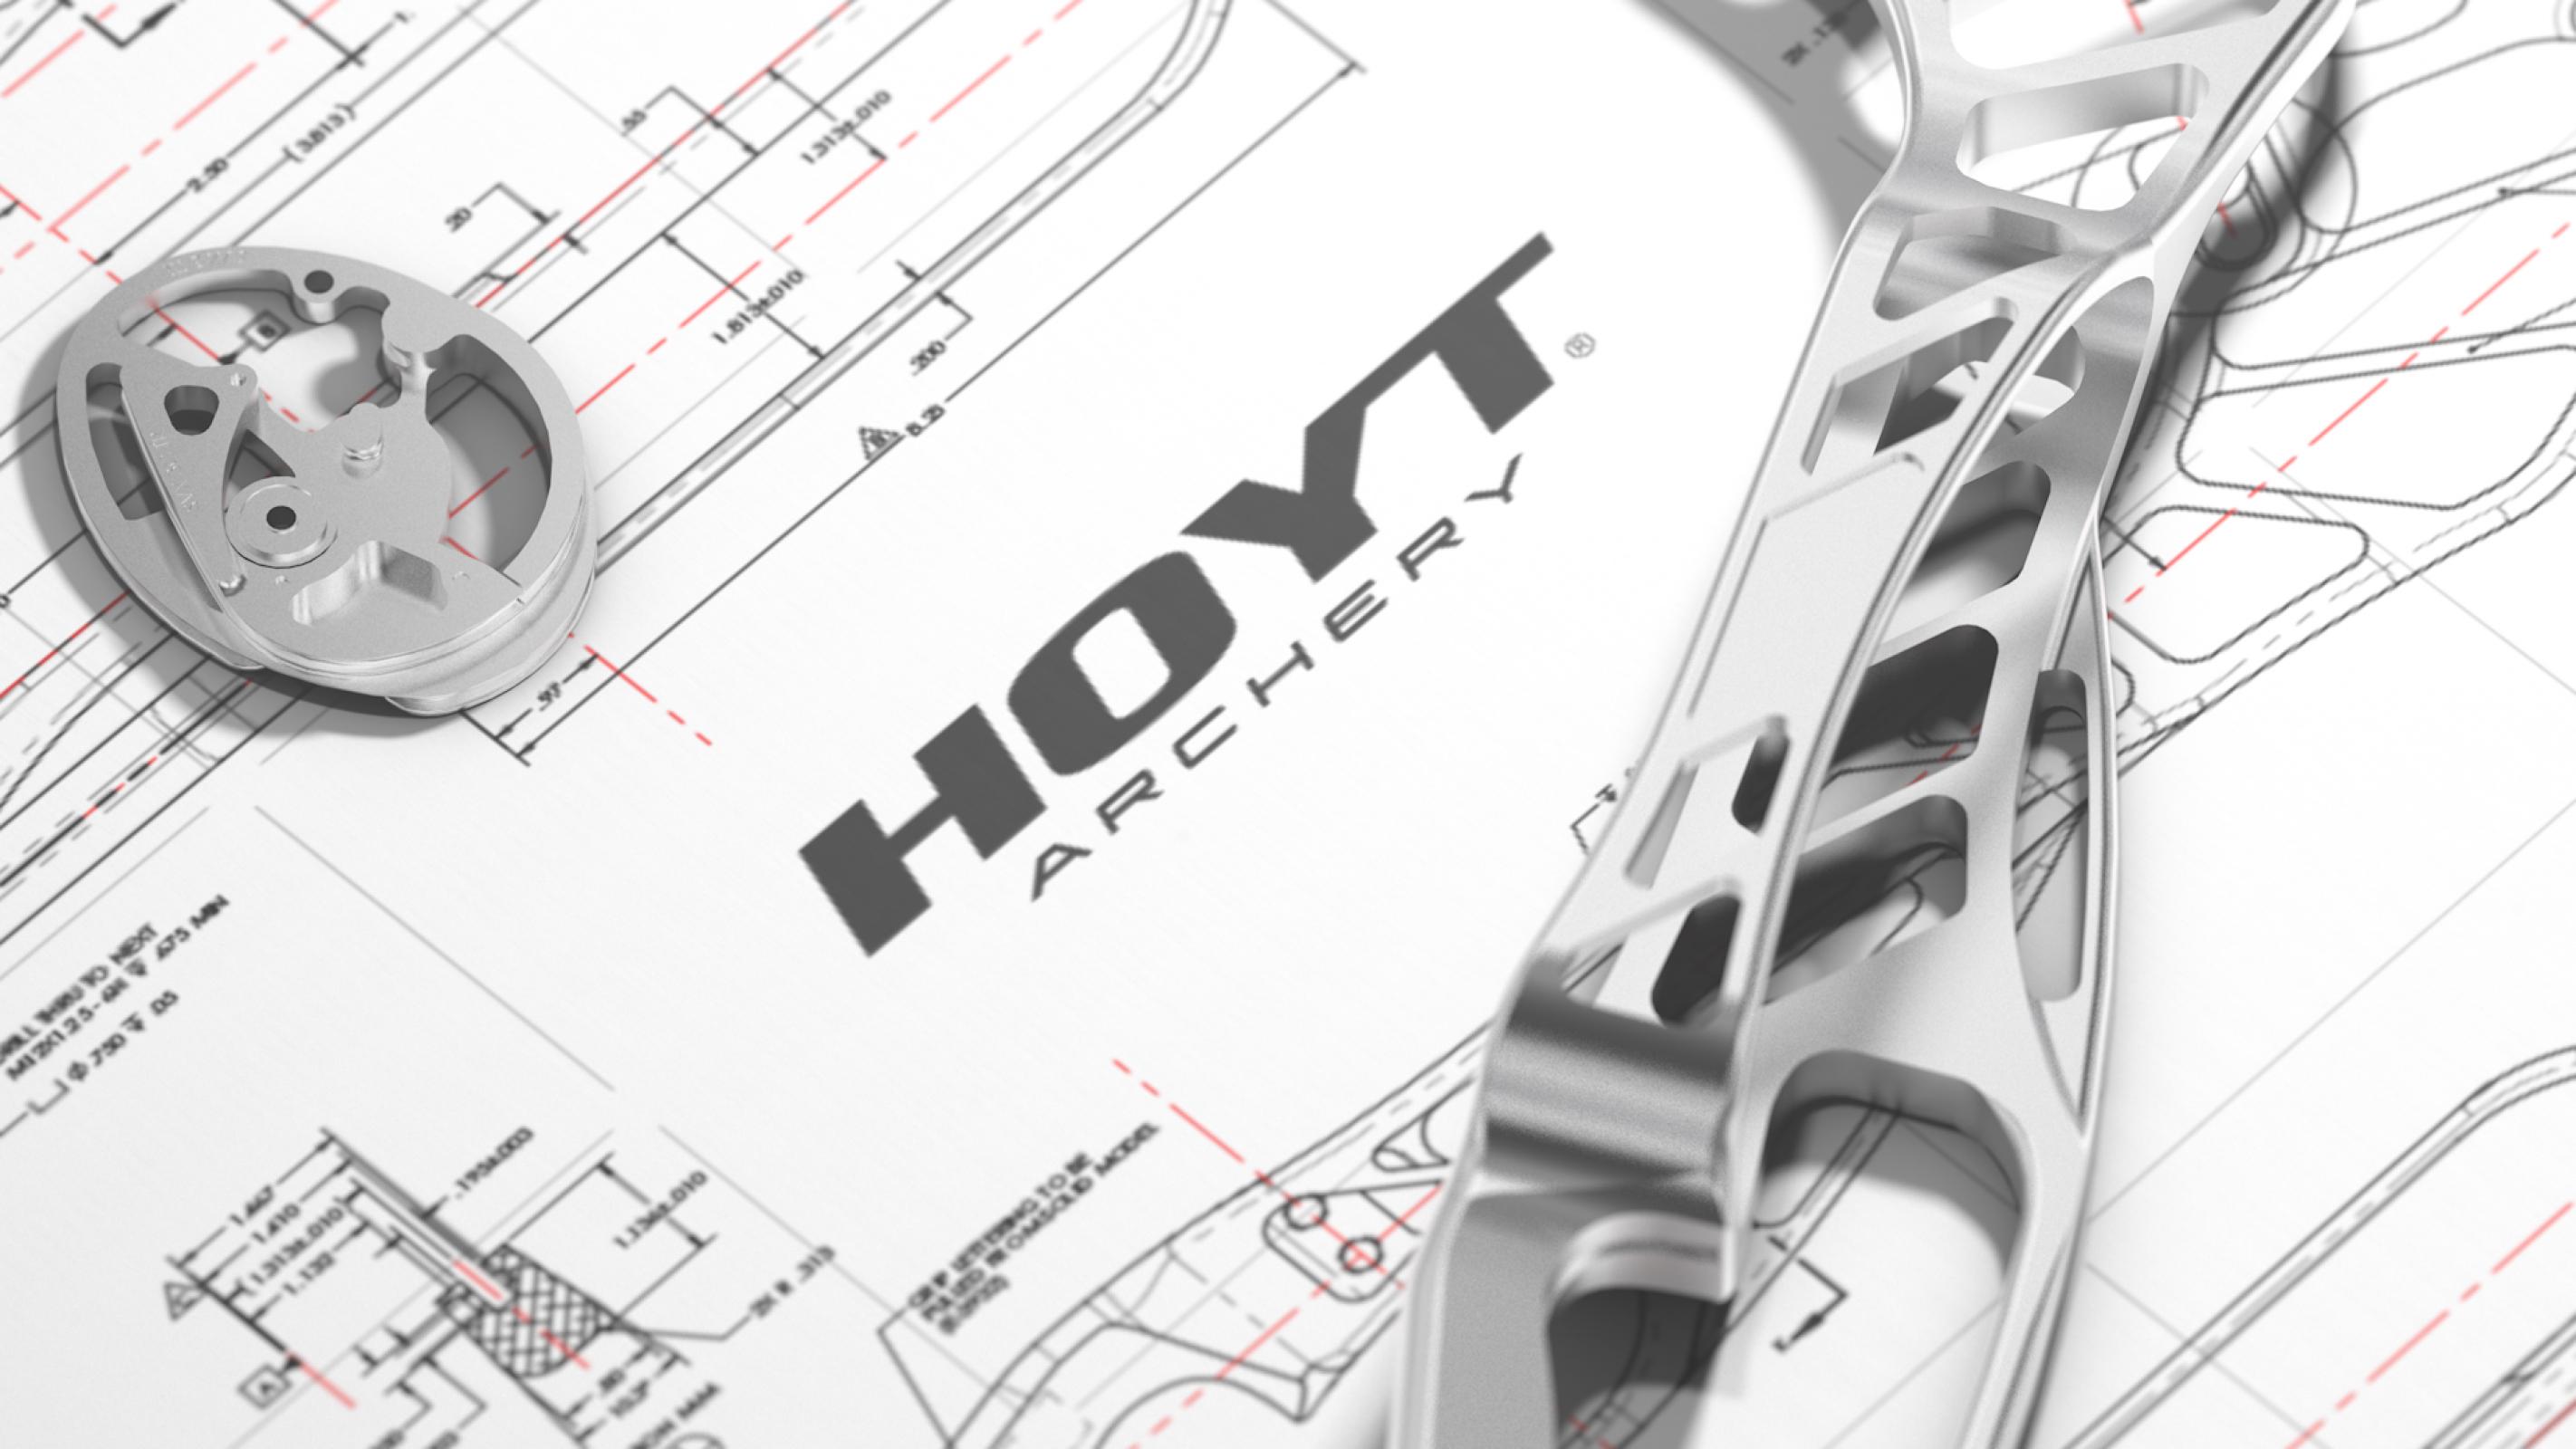 Hoyt INVICTA 2020